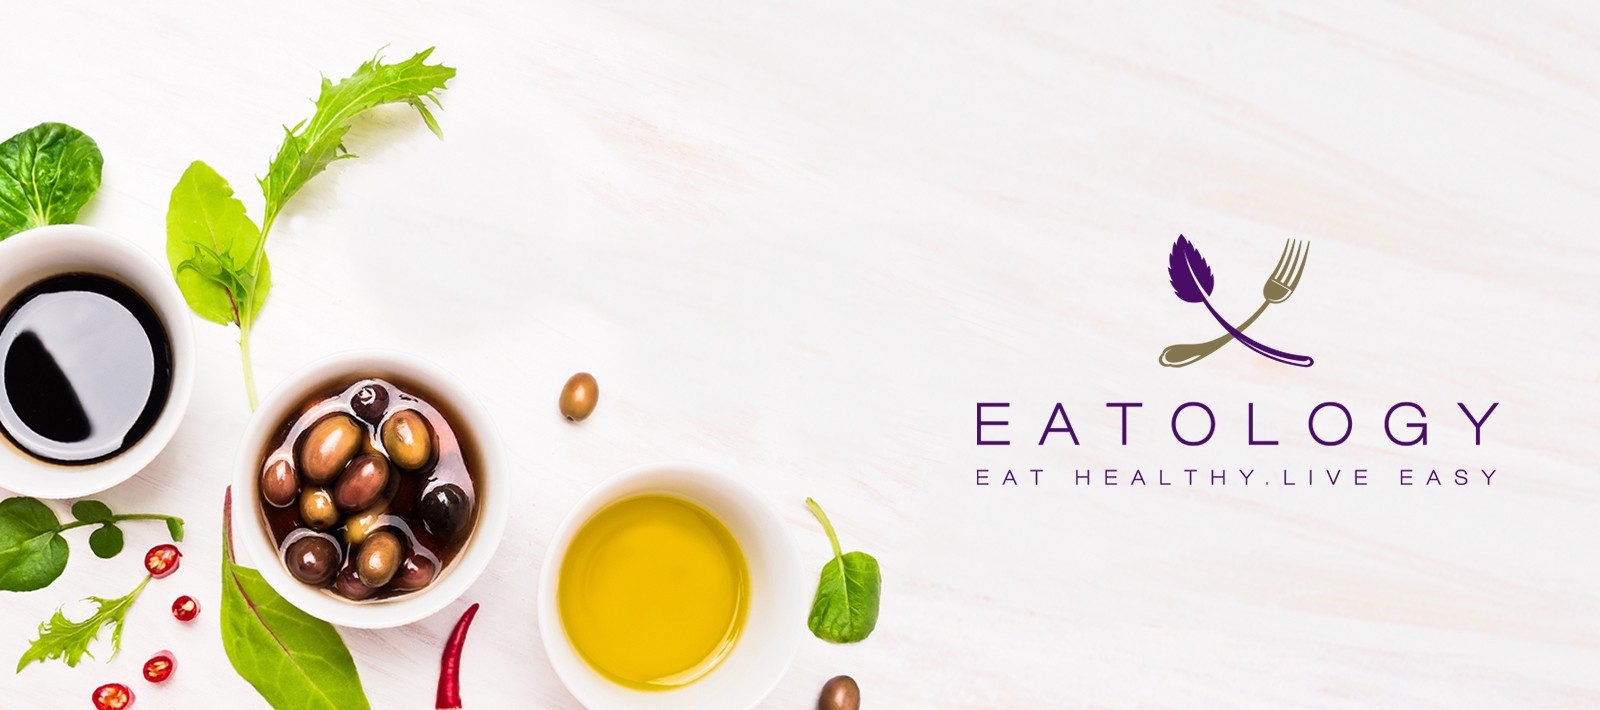 Eatology-food-brand-creation